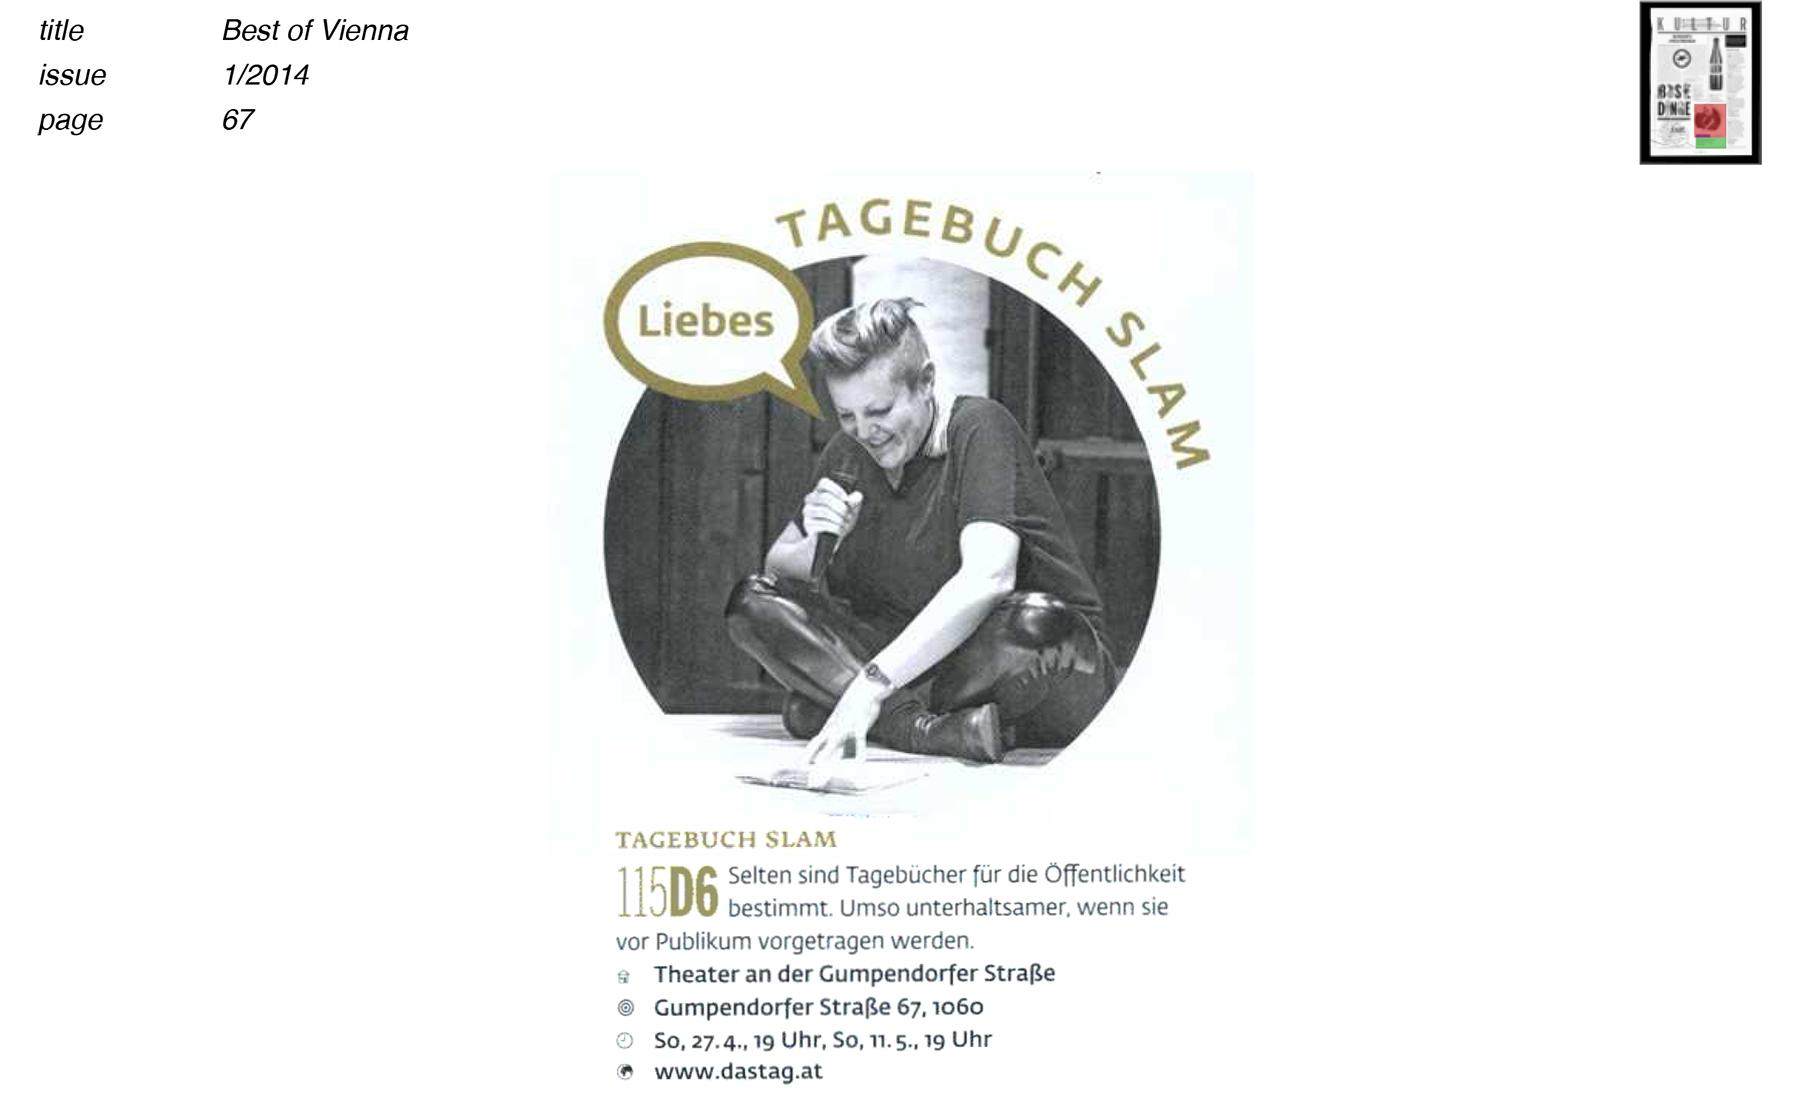 1401_Best of Vienna_TAGebuch Slam